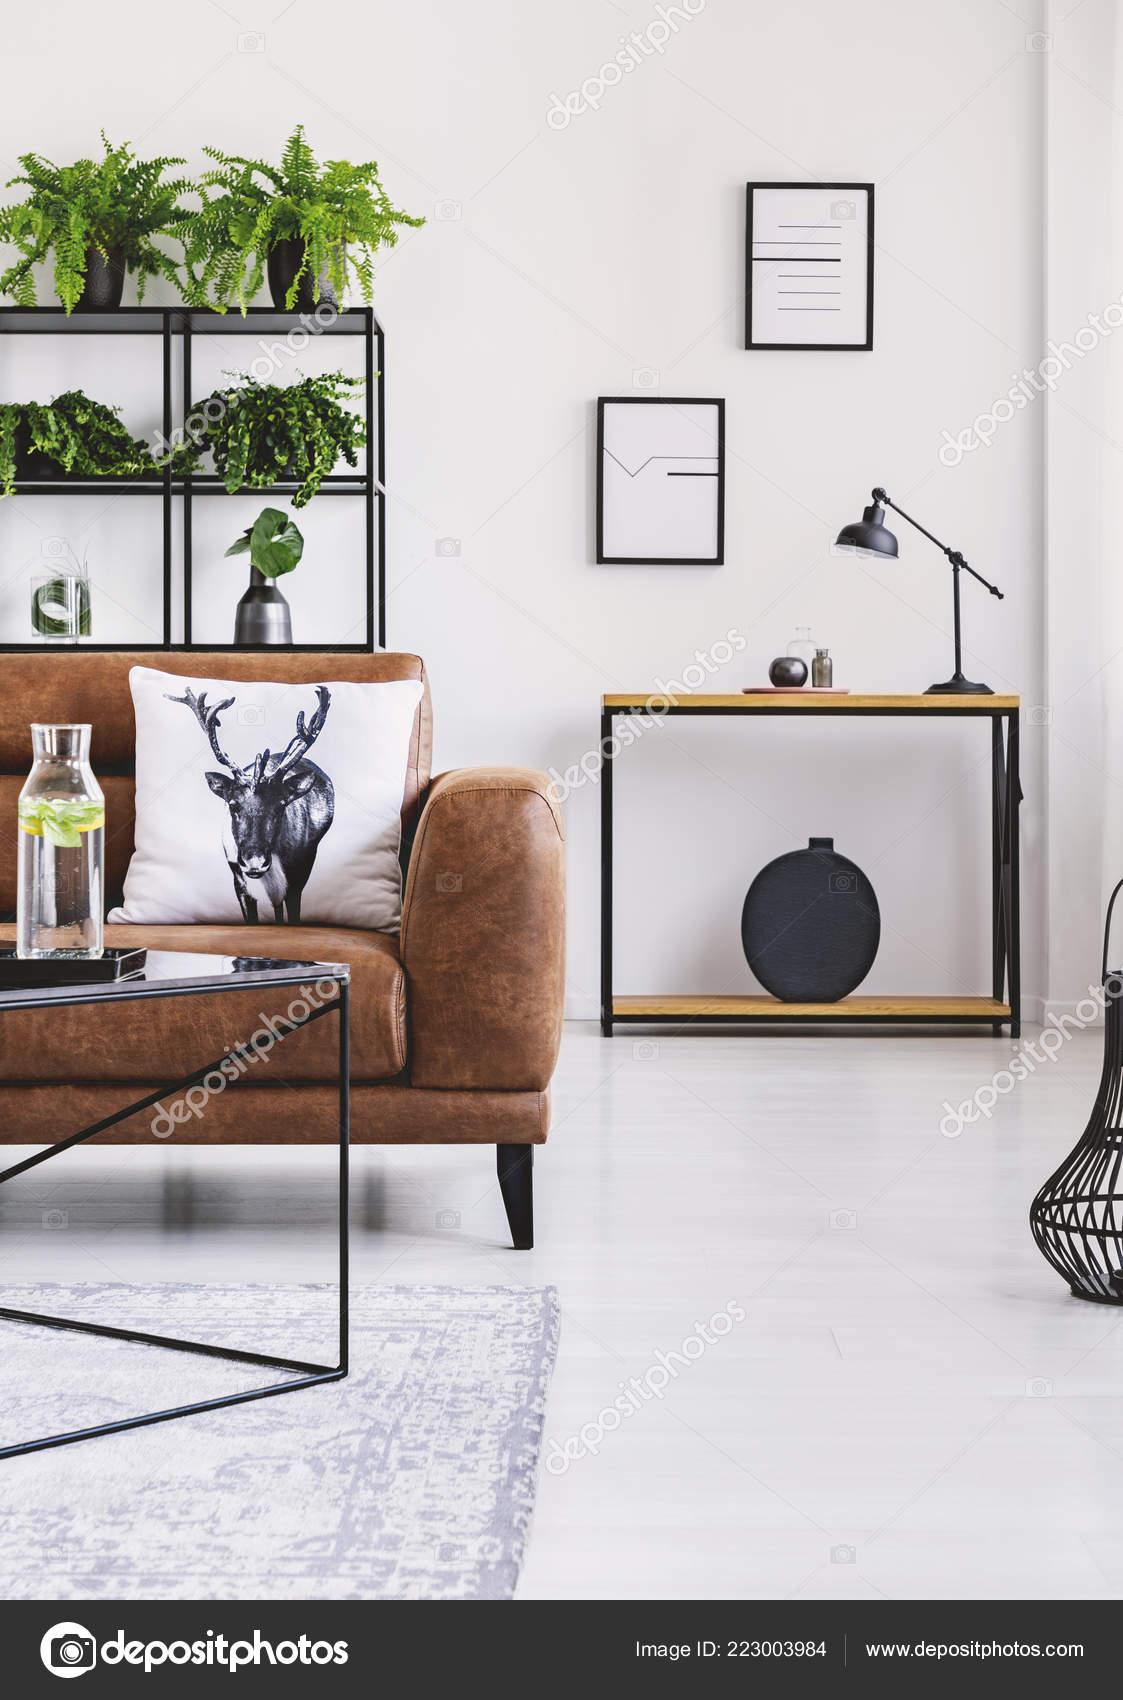 Pleasing Urban Jungle Modern Home Interior Pots Plant Shelf Pabps2019 Chair Design Images Pabps2019Com